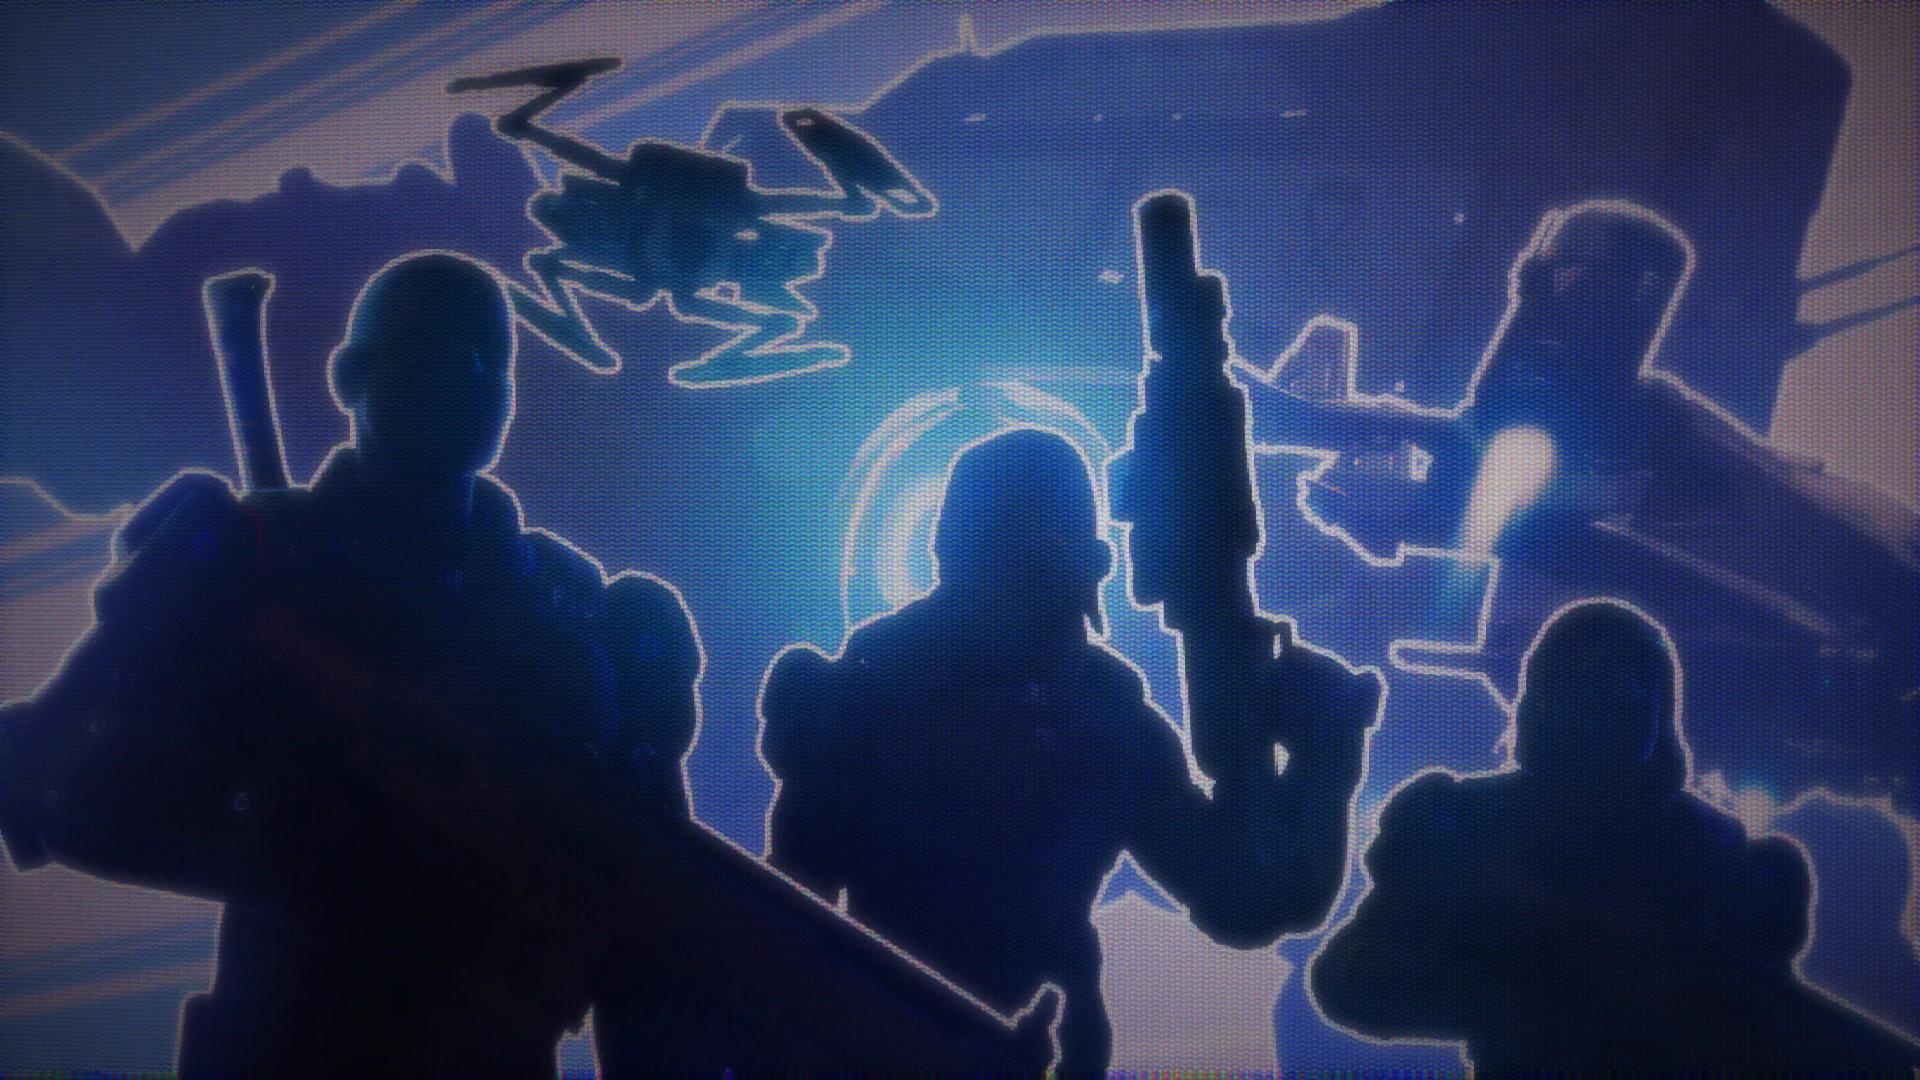 Xcom Enemy Unknown Scifi Warrior Weapon Y Wallpaper 1920x1080